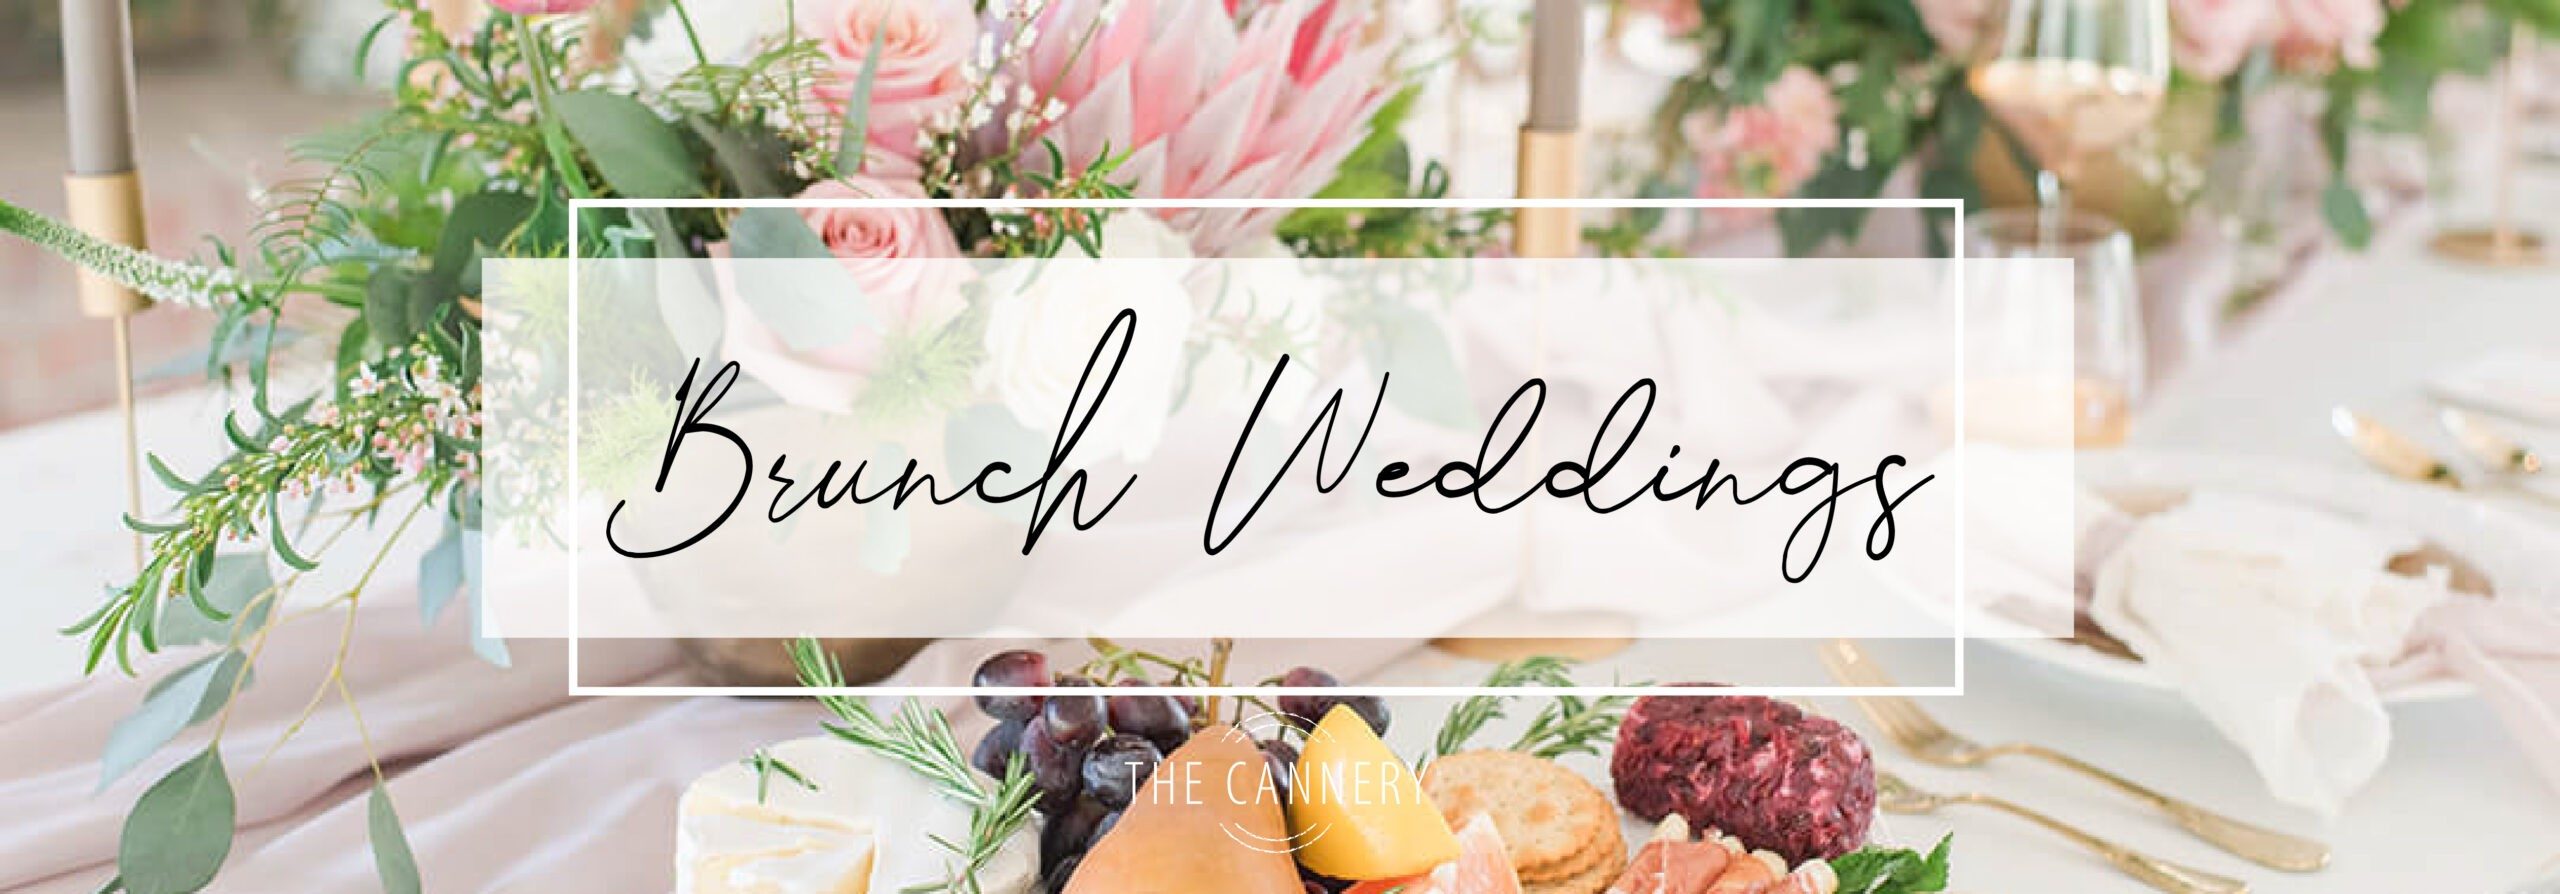 Brunch Weddings!